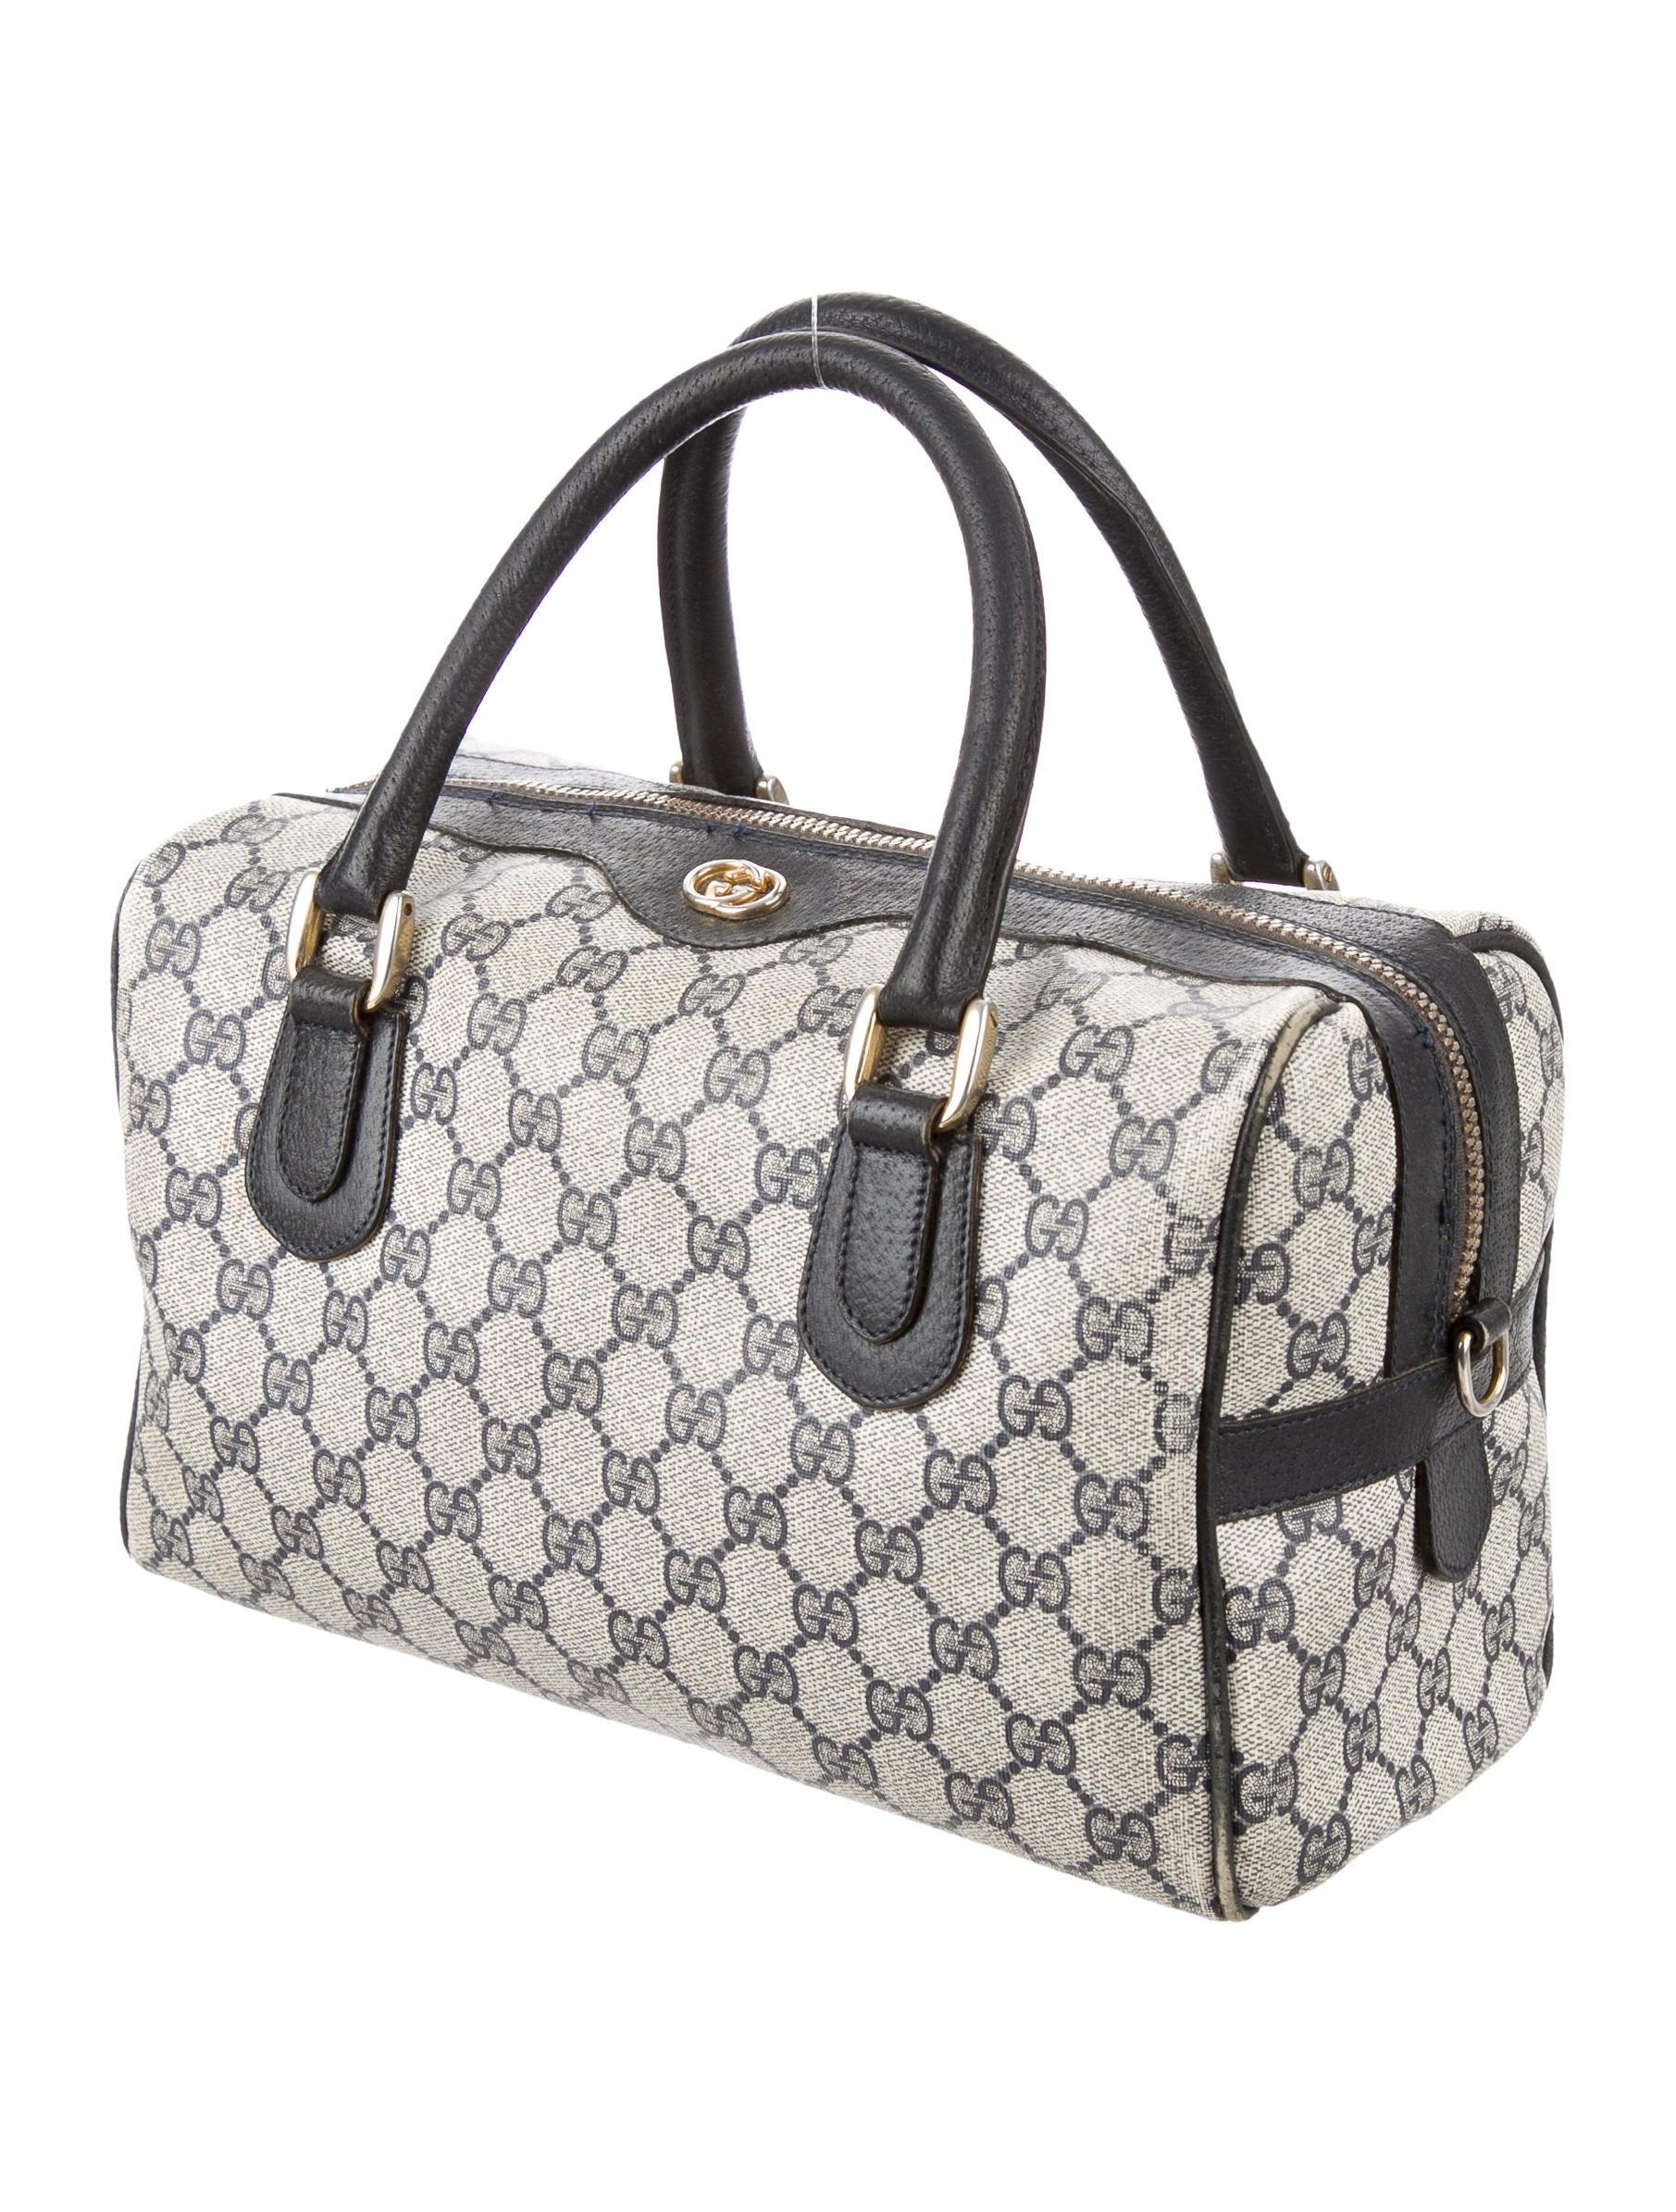 Boston Bag Patchwork Tutorial: Gucci Vintage GG Plus Boston Bag